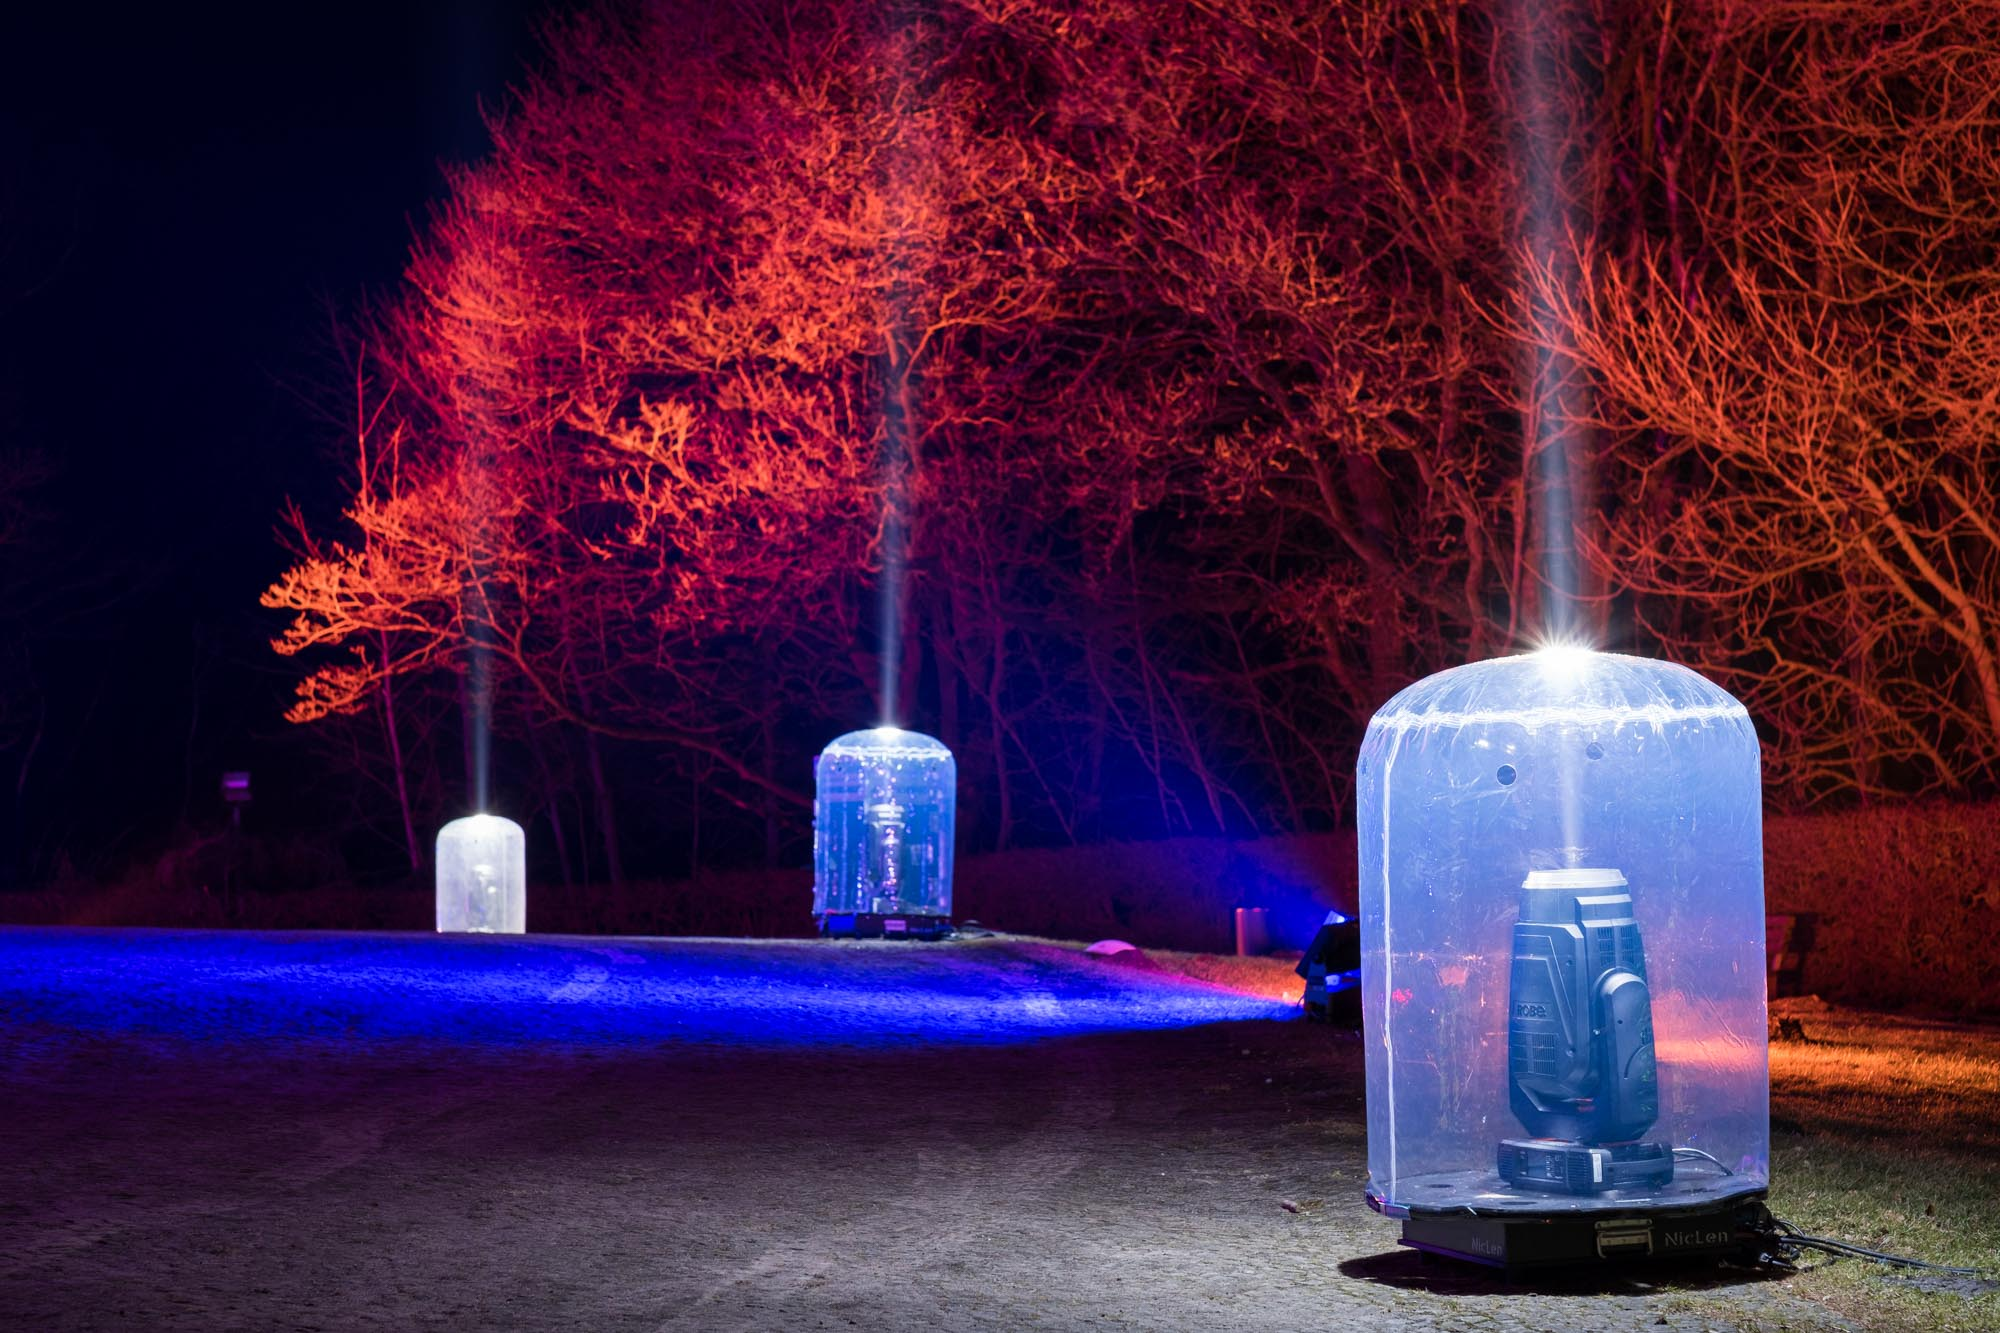 Hermann leuchtet 2018 Laser am Hermannsdenkmal